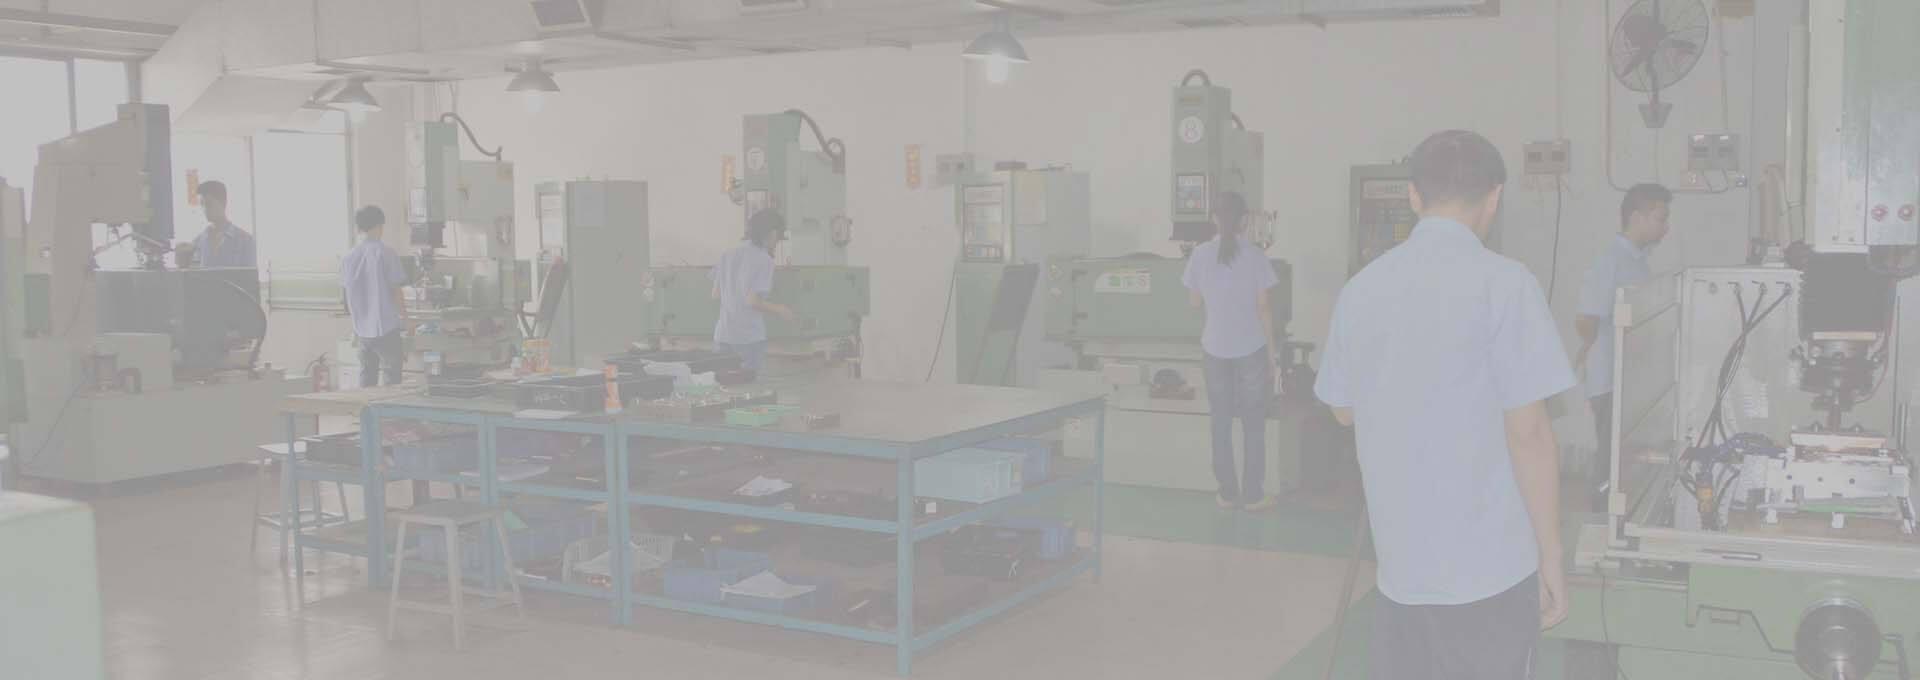 EDM sparking manufacturing